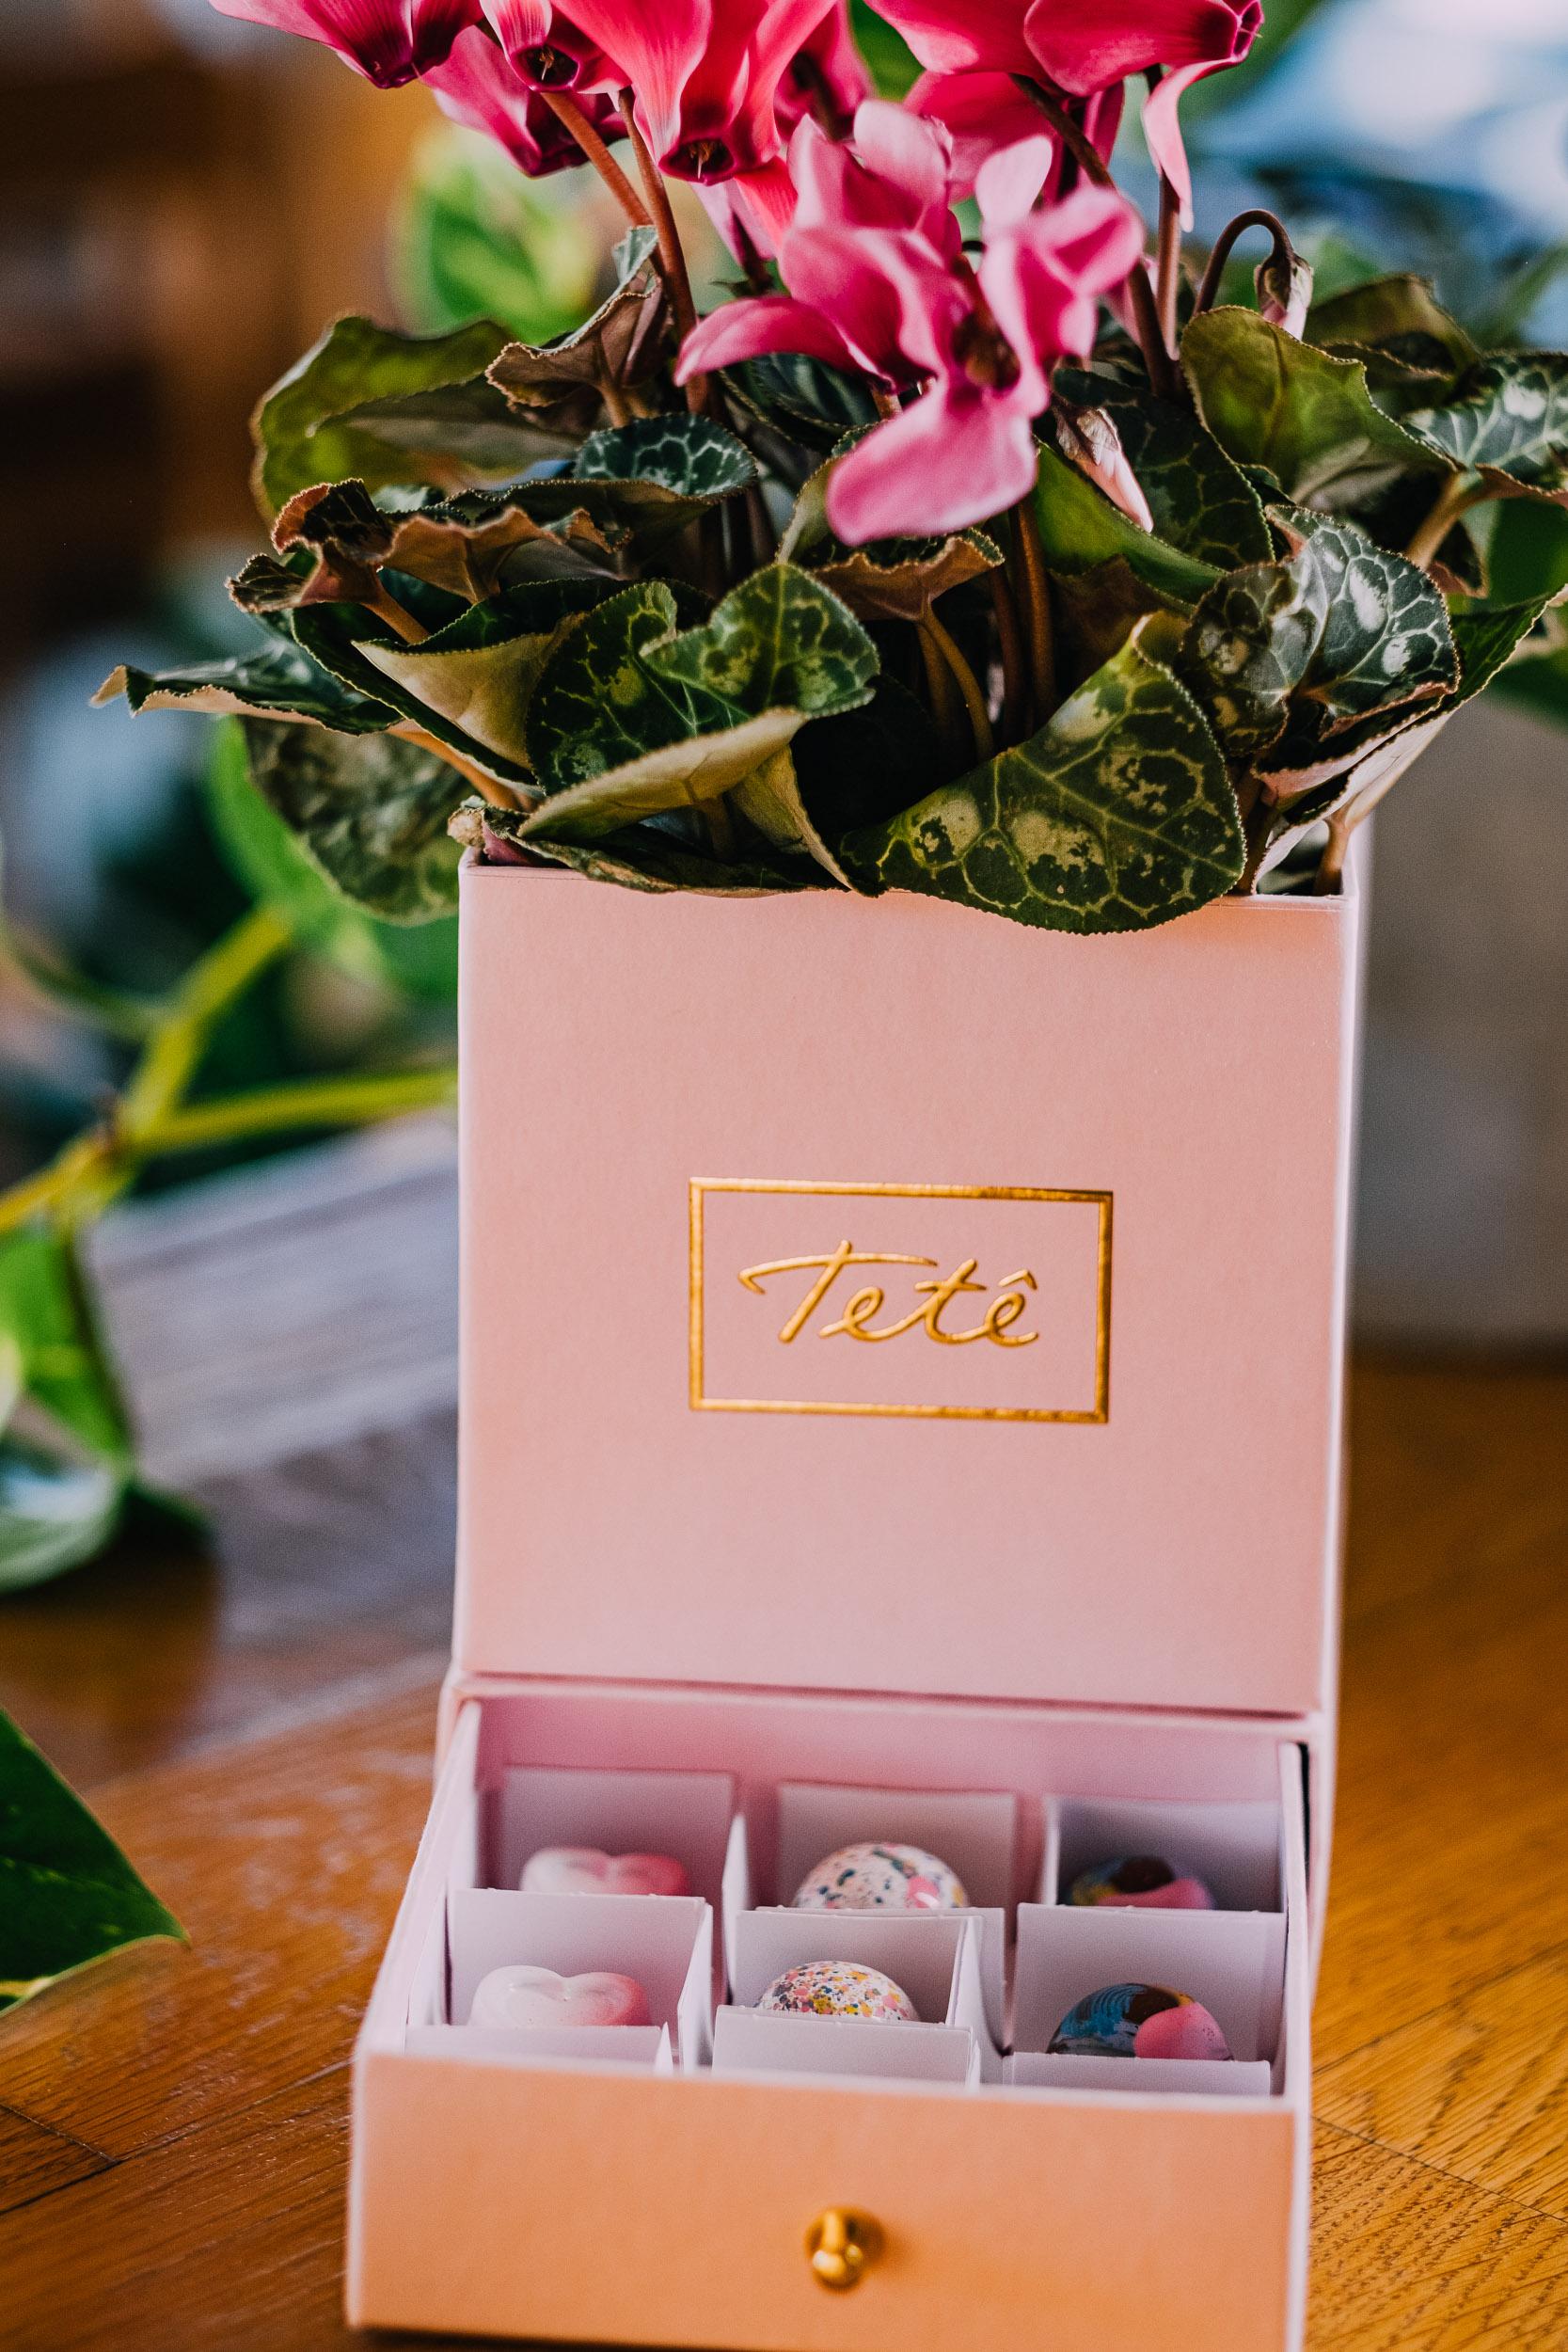 Caixa com Flores eBombons